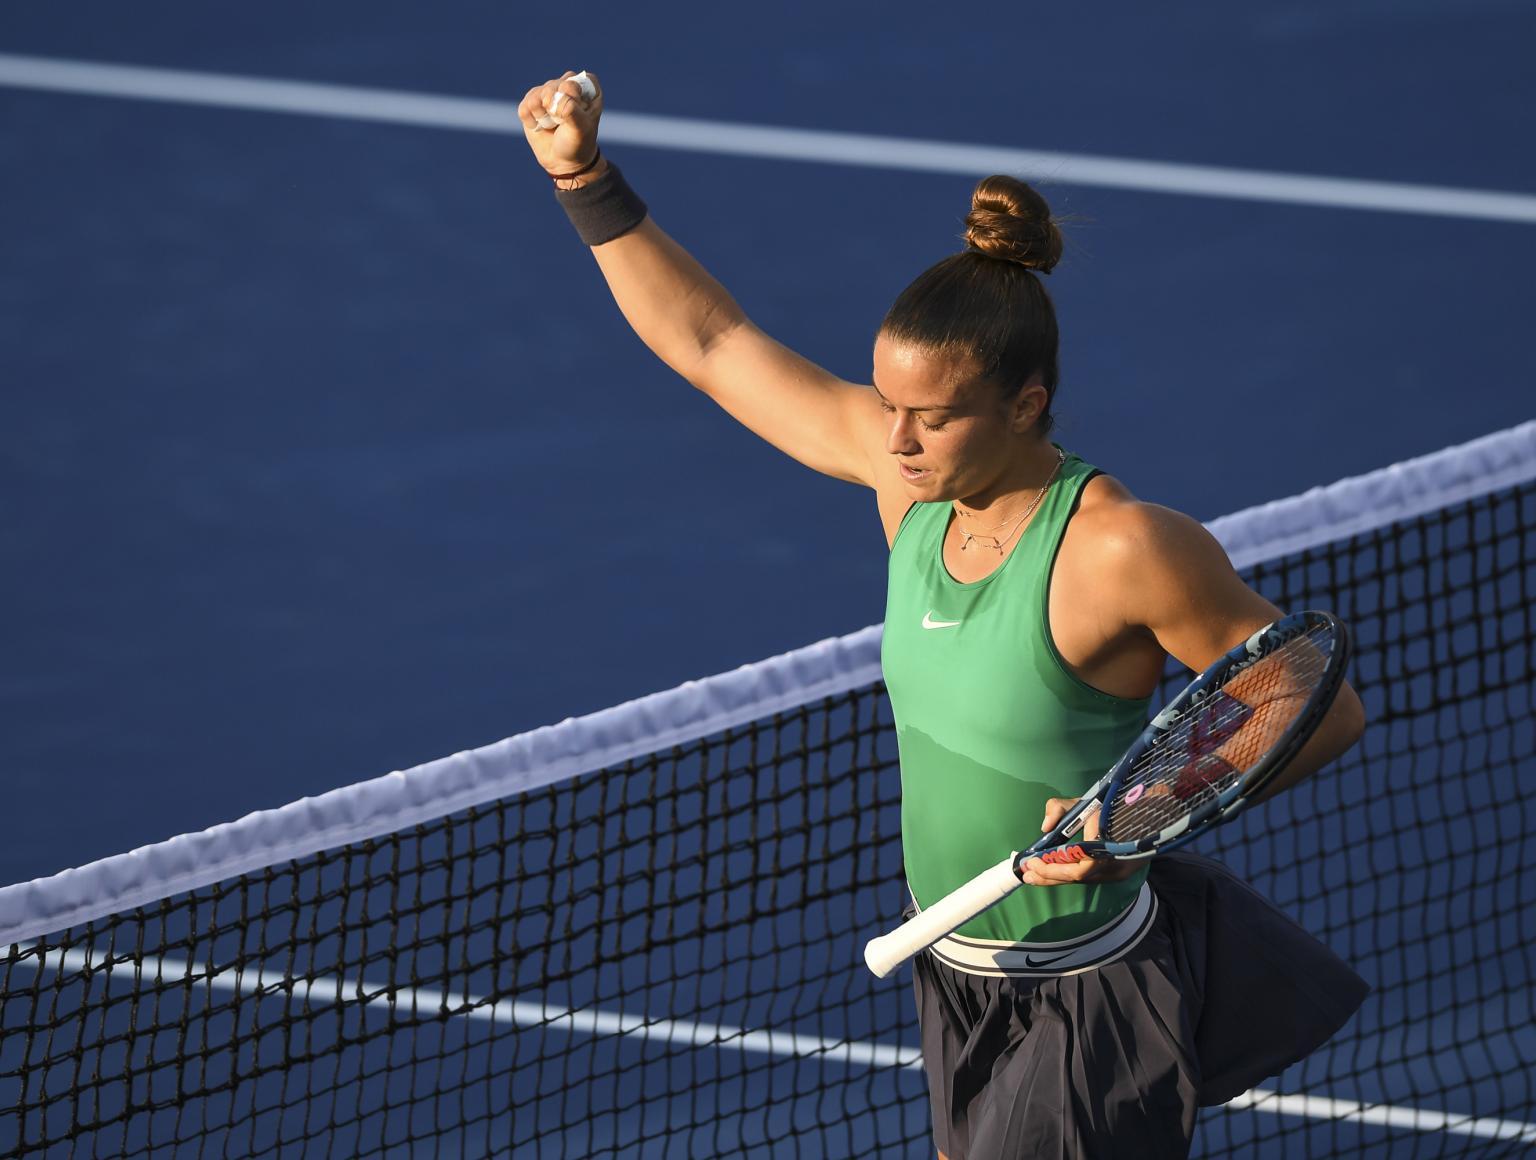 Solid win for Sakkari over BNP Paribas Open champion Naomi Osaka